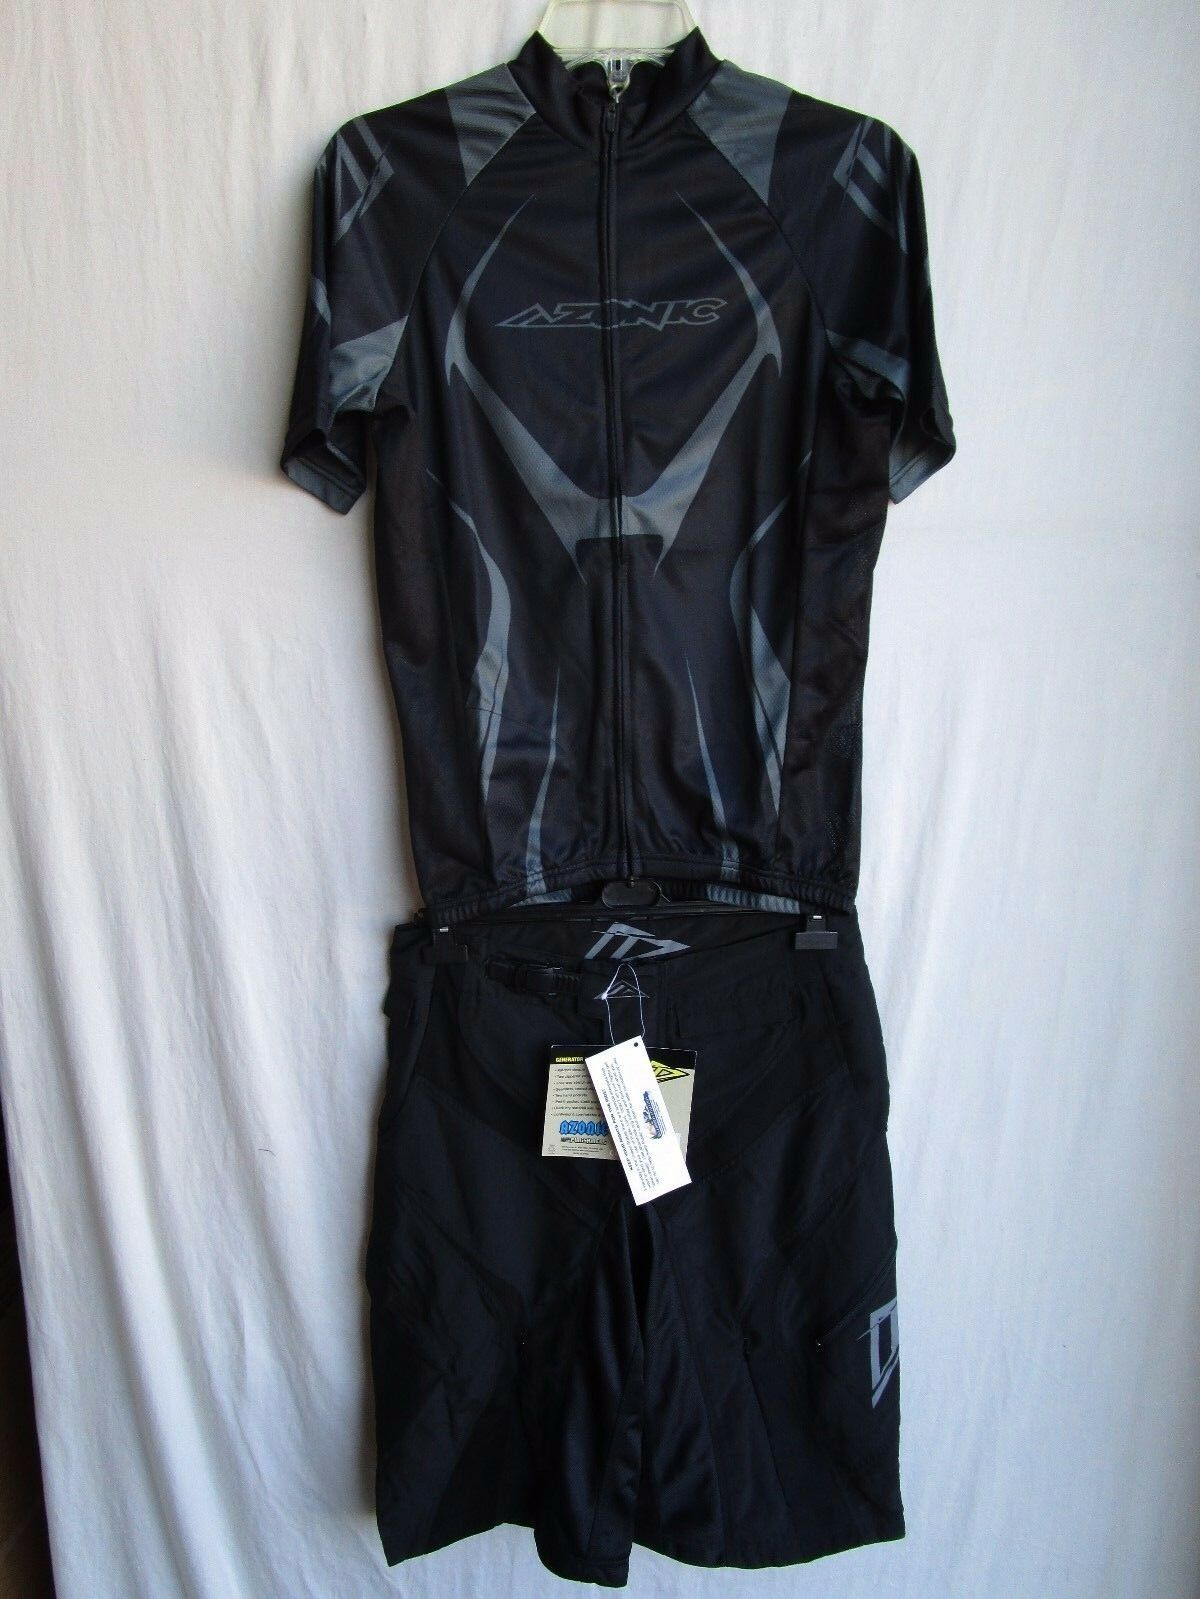 O'NEAL AZONIC Herren cycling combo combo combo set GENERATOR jersey sz SMALL & shorts sz 28 ddd884